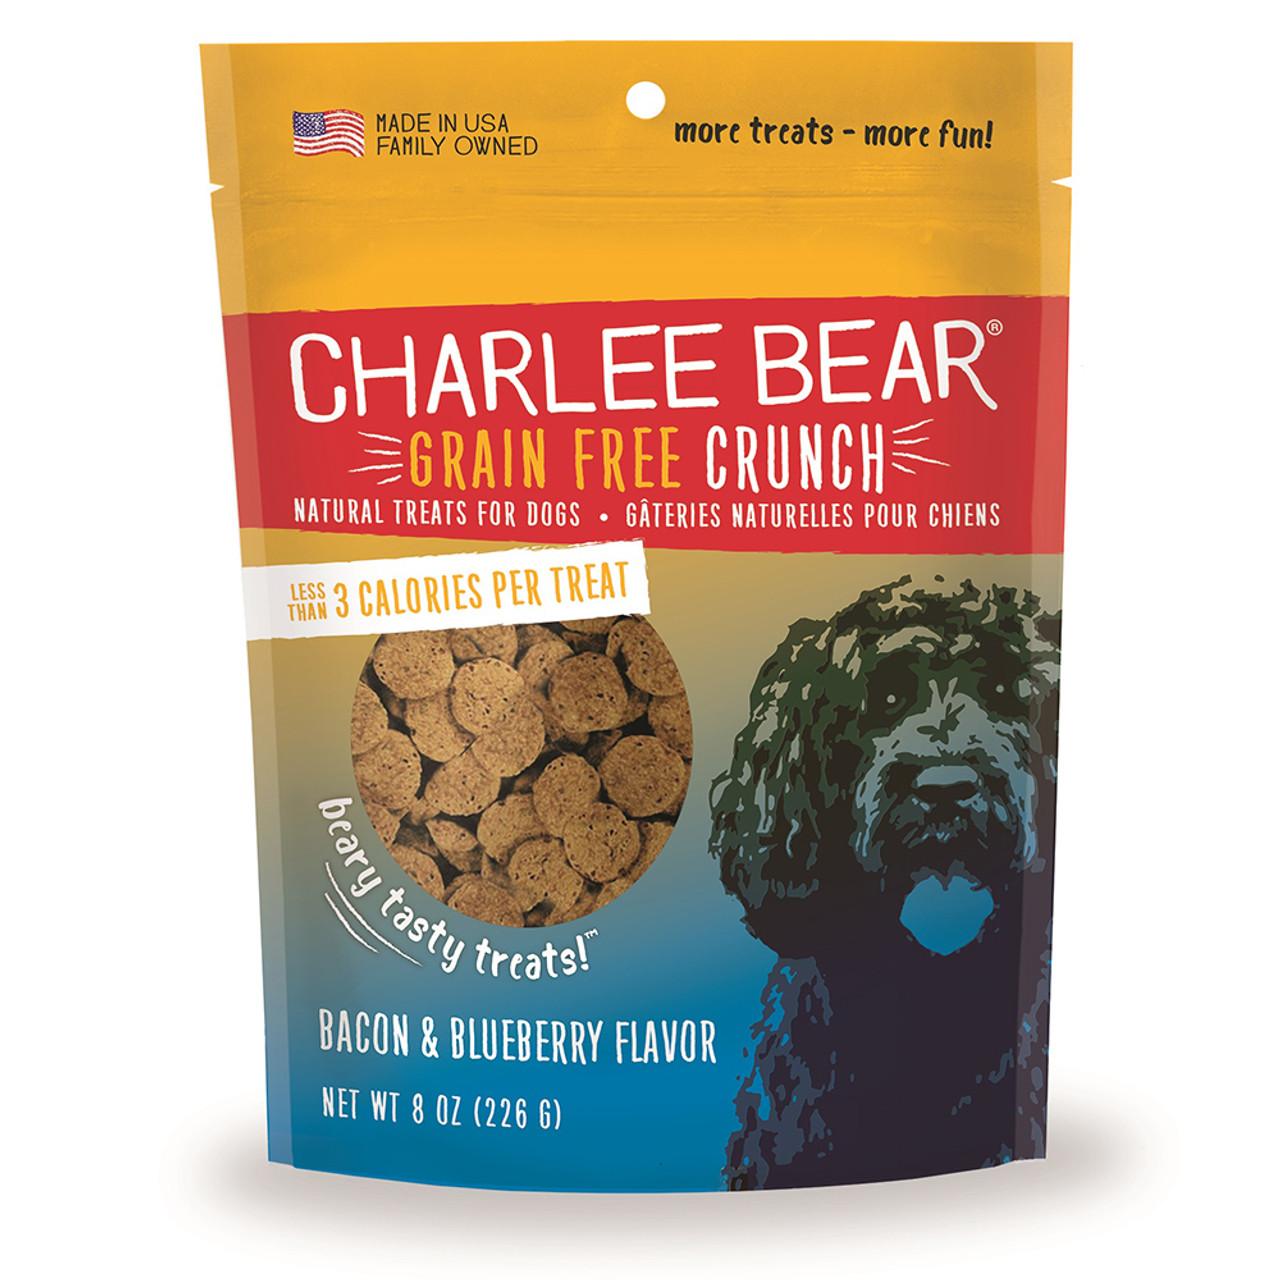 Charlee Bear Crunch Bacon & Blueberry Flavor Grain-Free Dog Treats